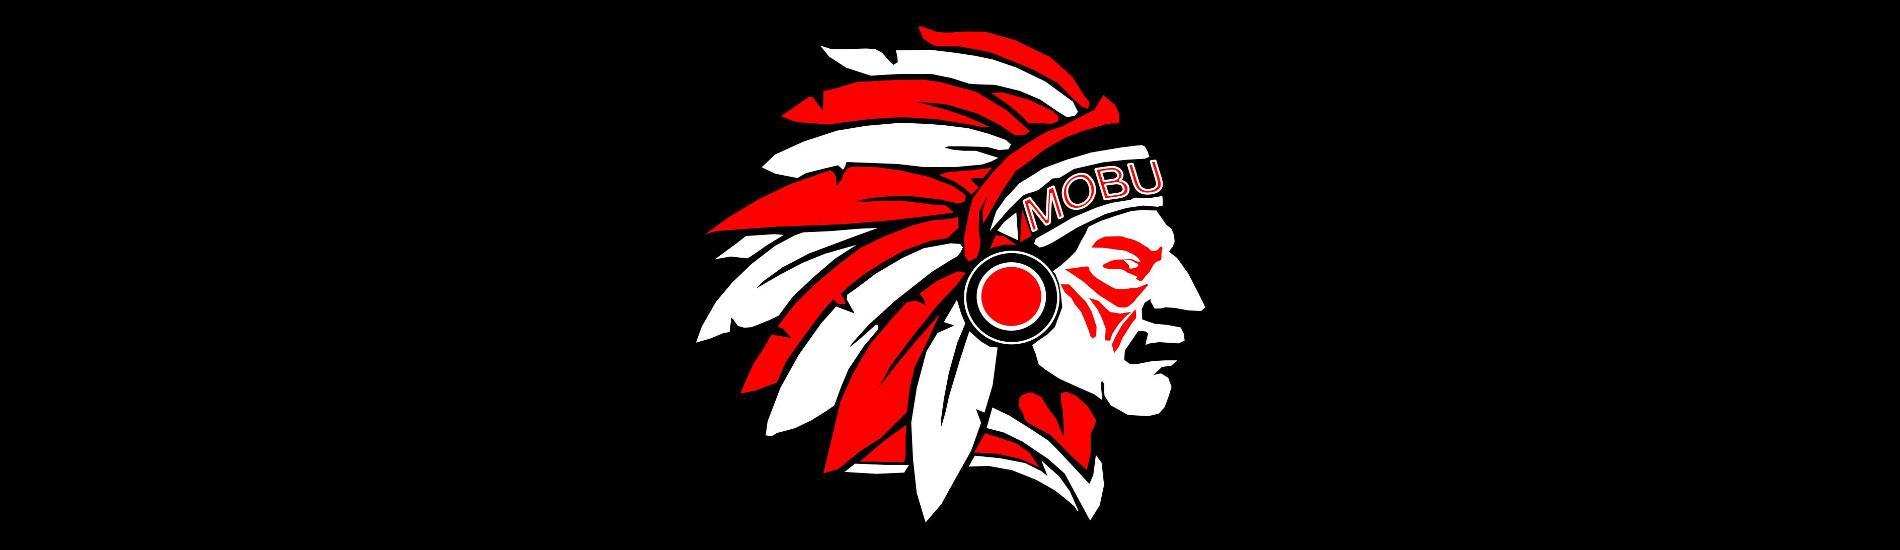 Mobuck